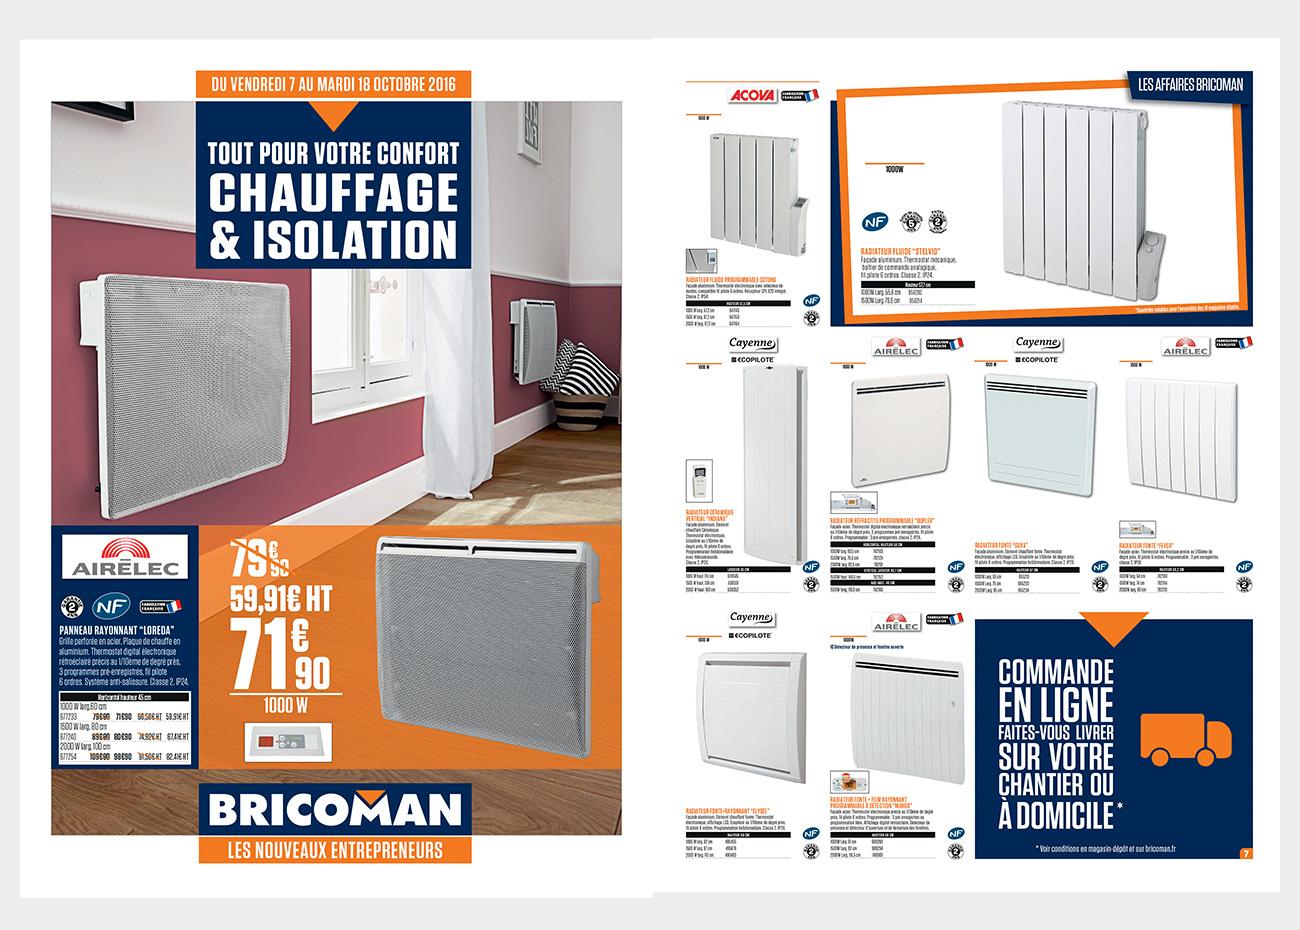 Bricoman - Catalogues And Tracts - Evo concernant Bricoman